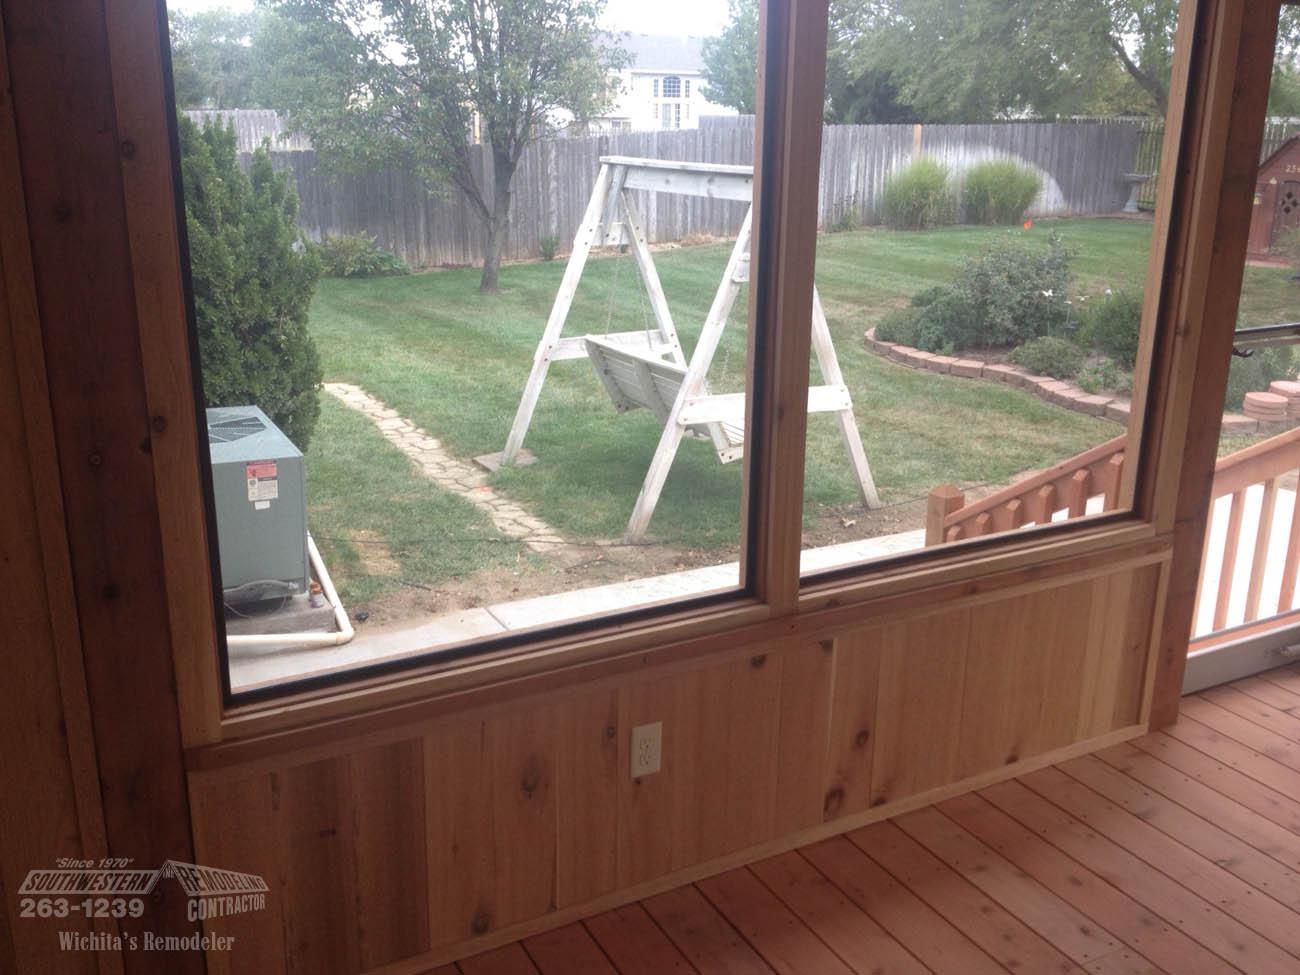 Outdoor Living by Southwestern Remodeling   Wichita, KS